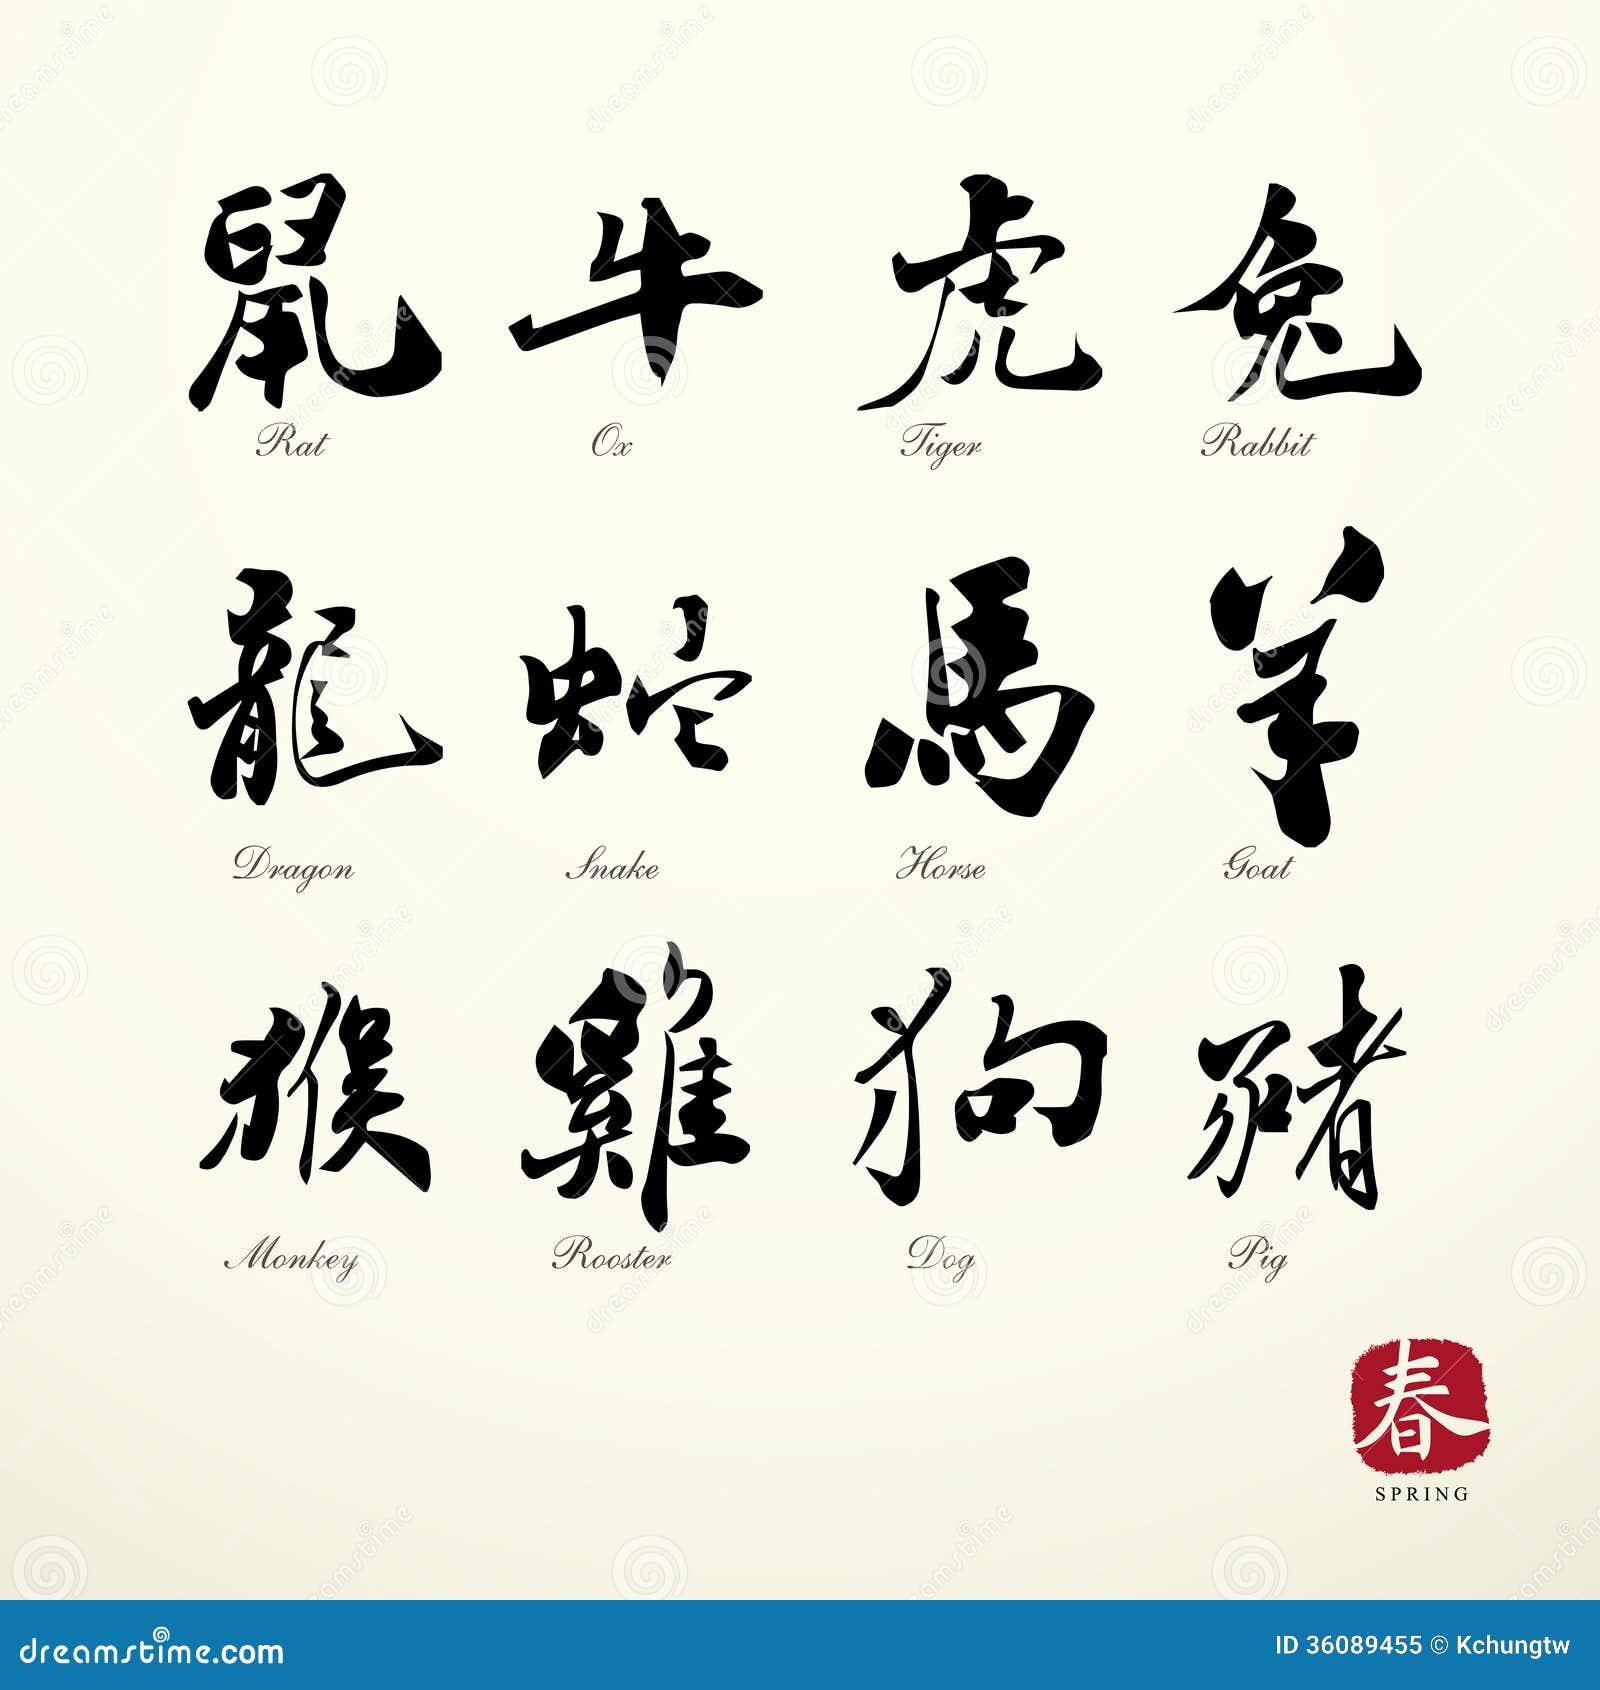 Calligraphy Zodiac Symbols Royalty Free Stock Photo